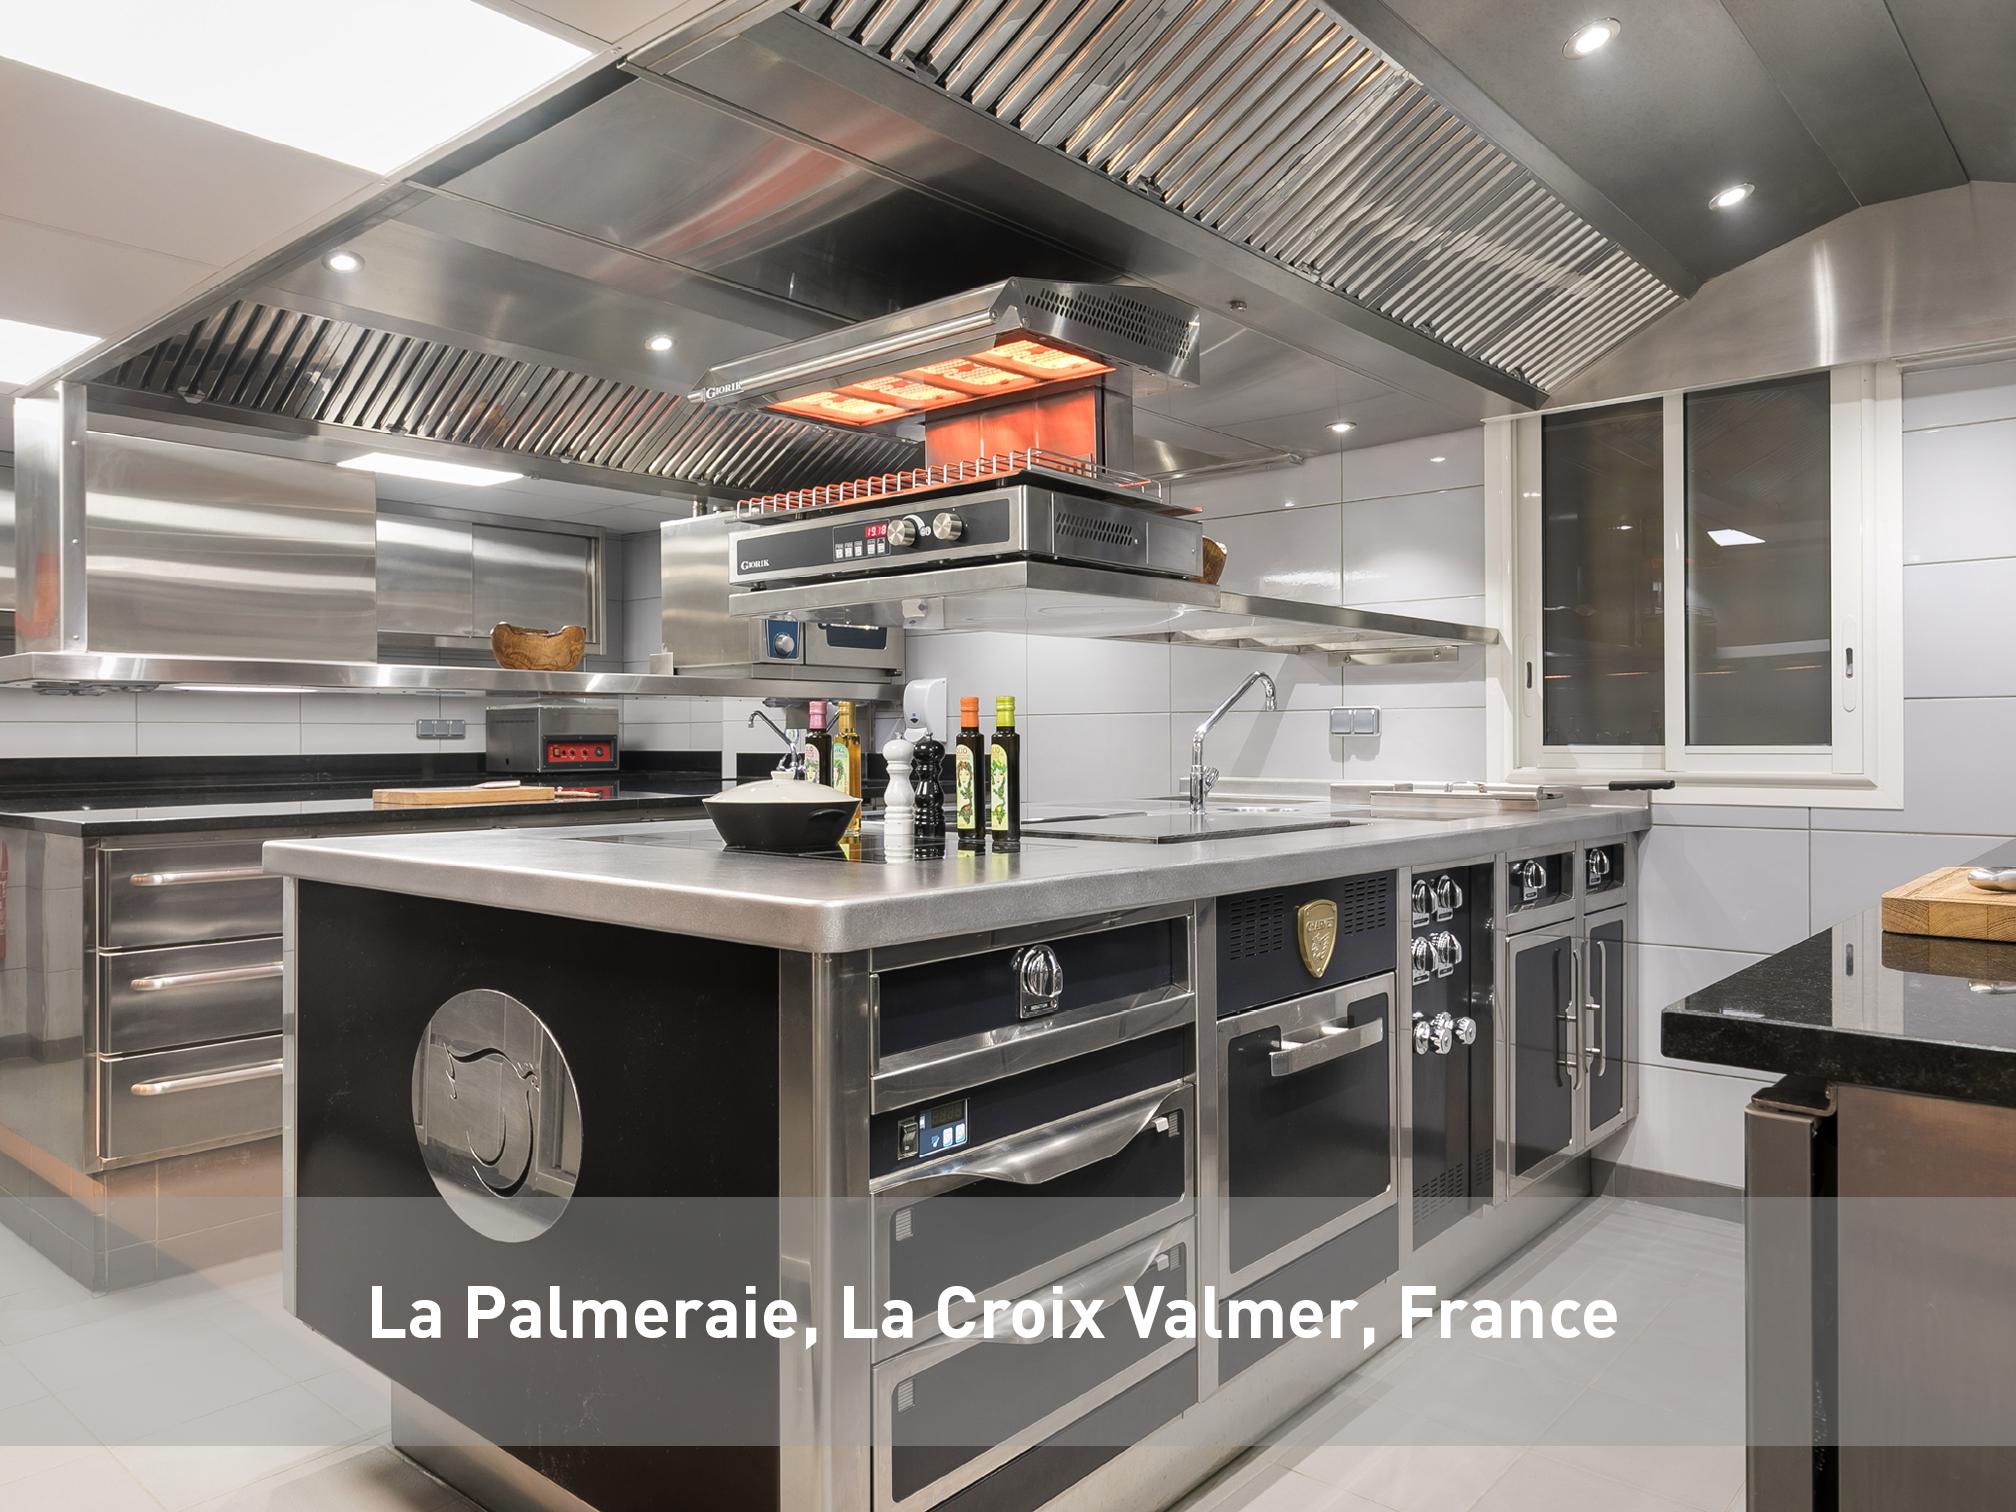 La-Palmeraie-Charvet